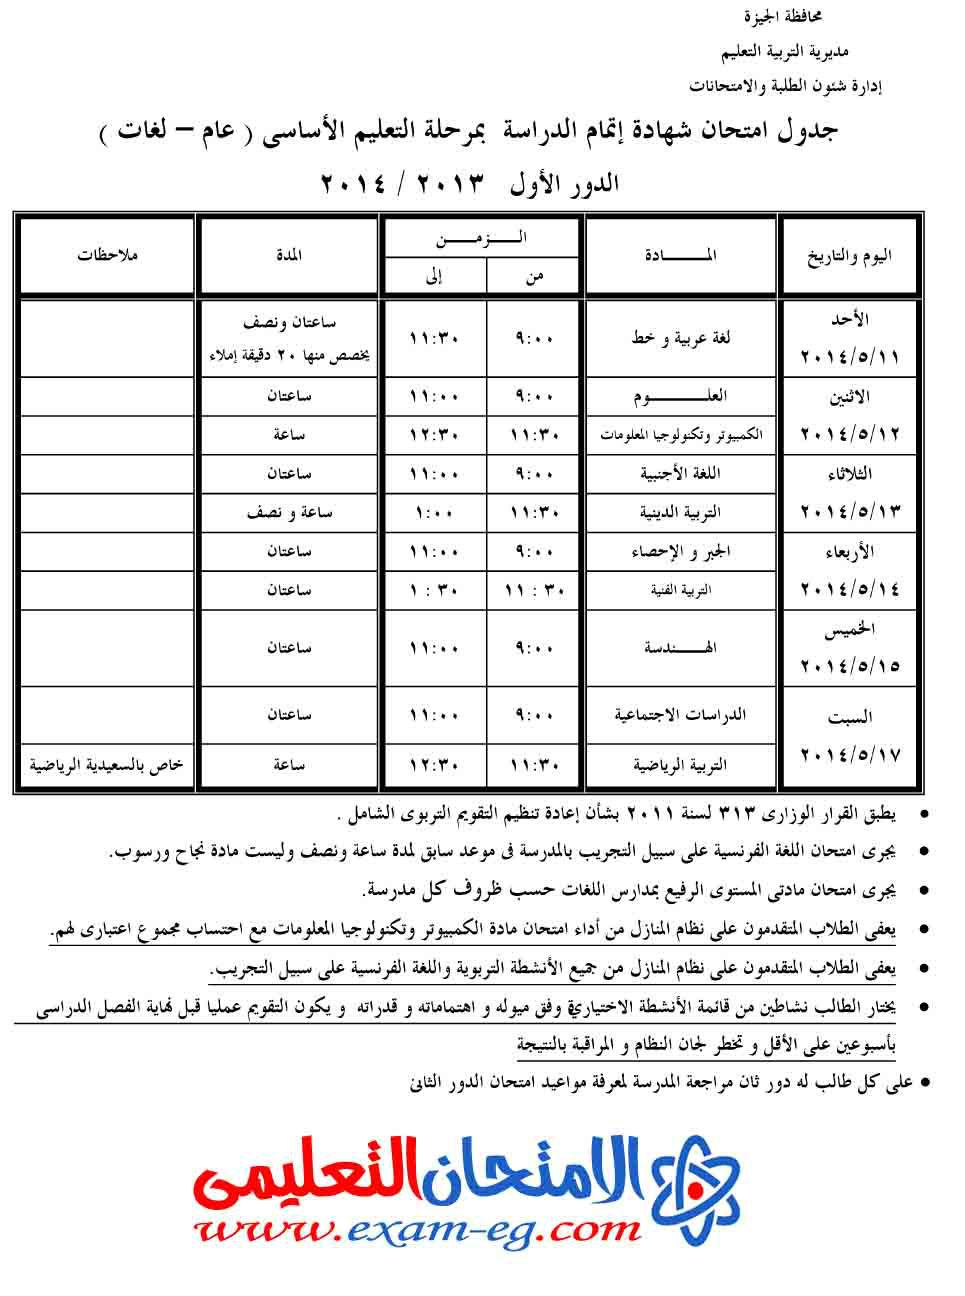 exam-eg.com_1397580096488.jpg